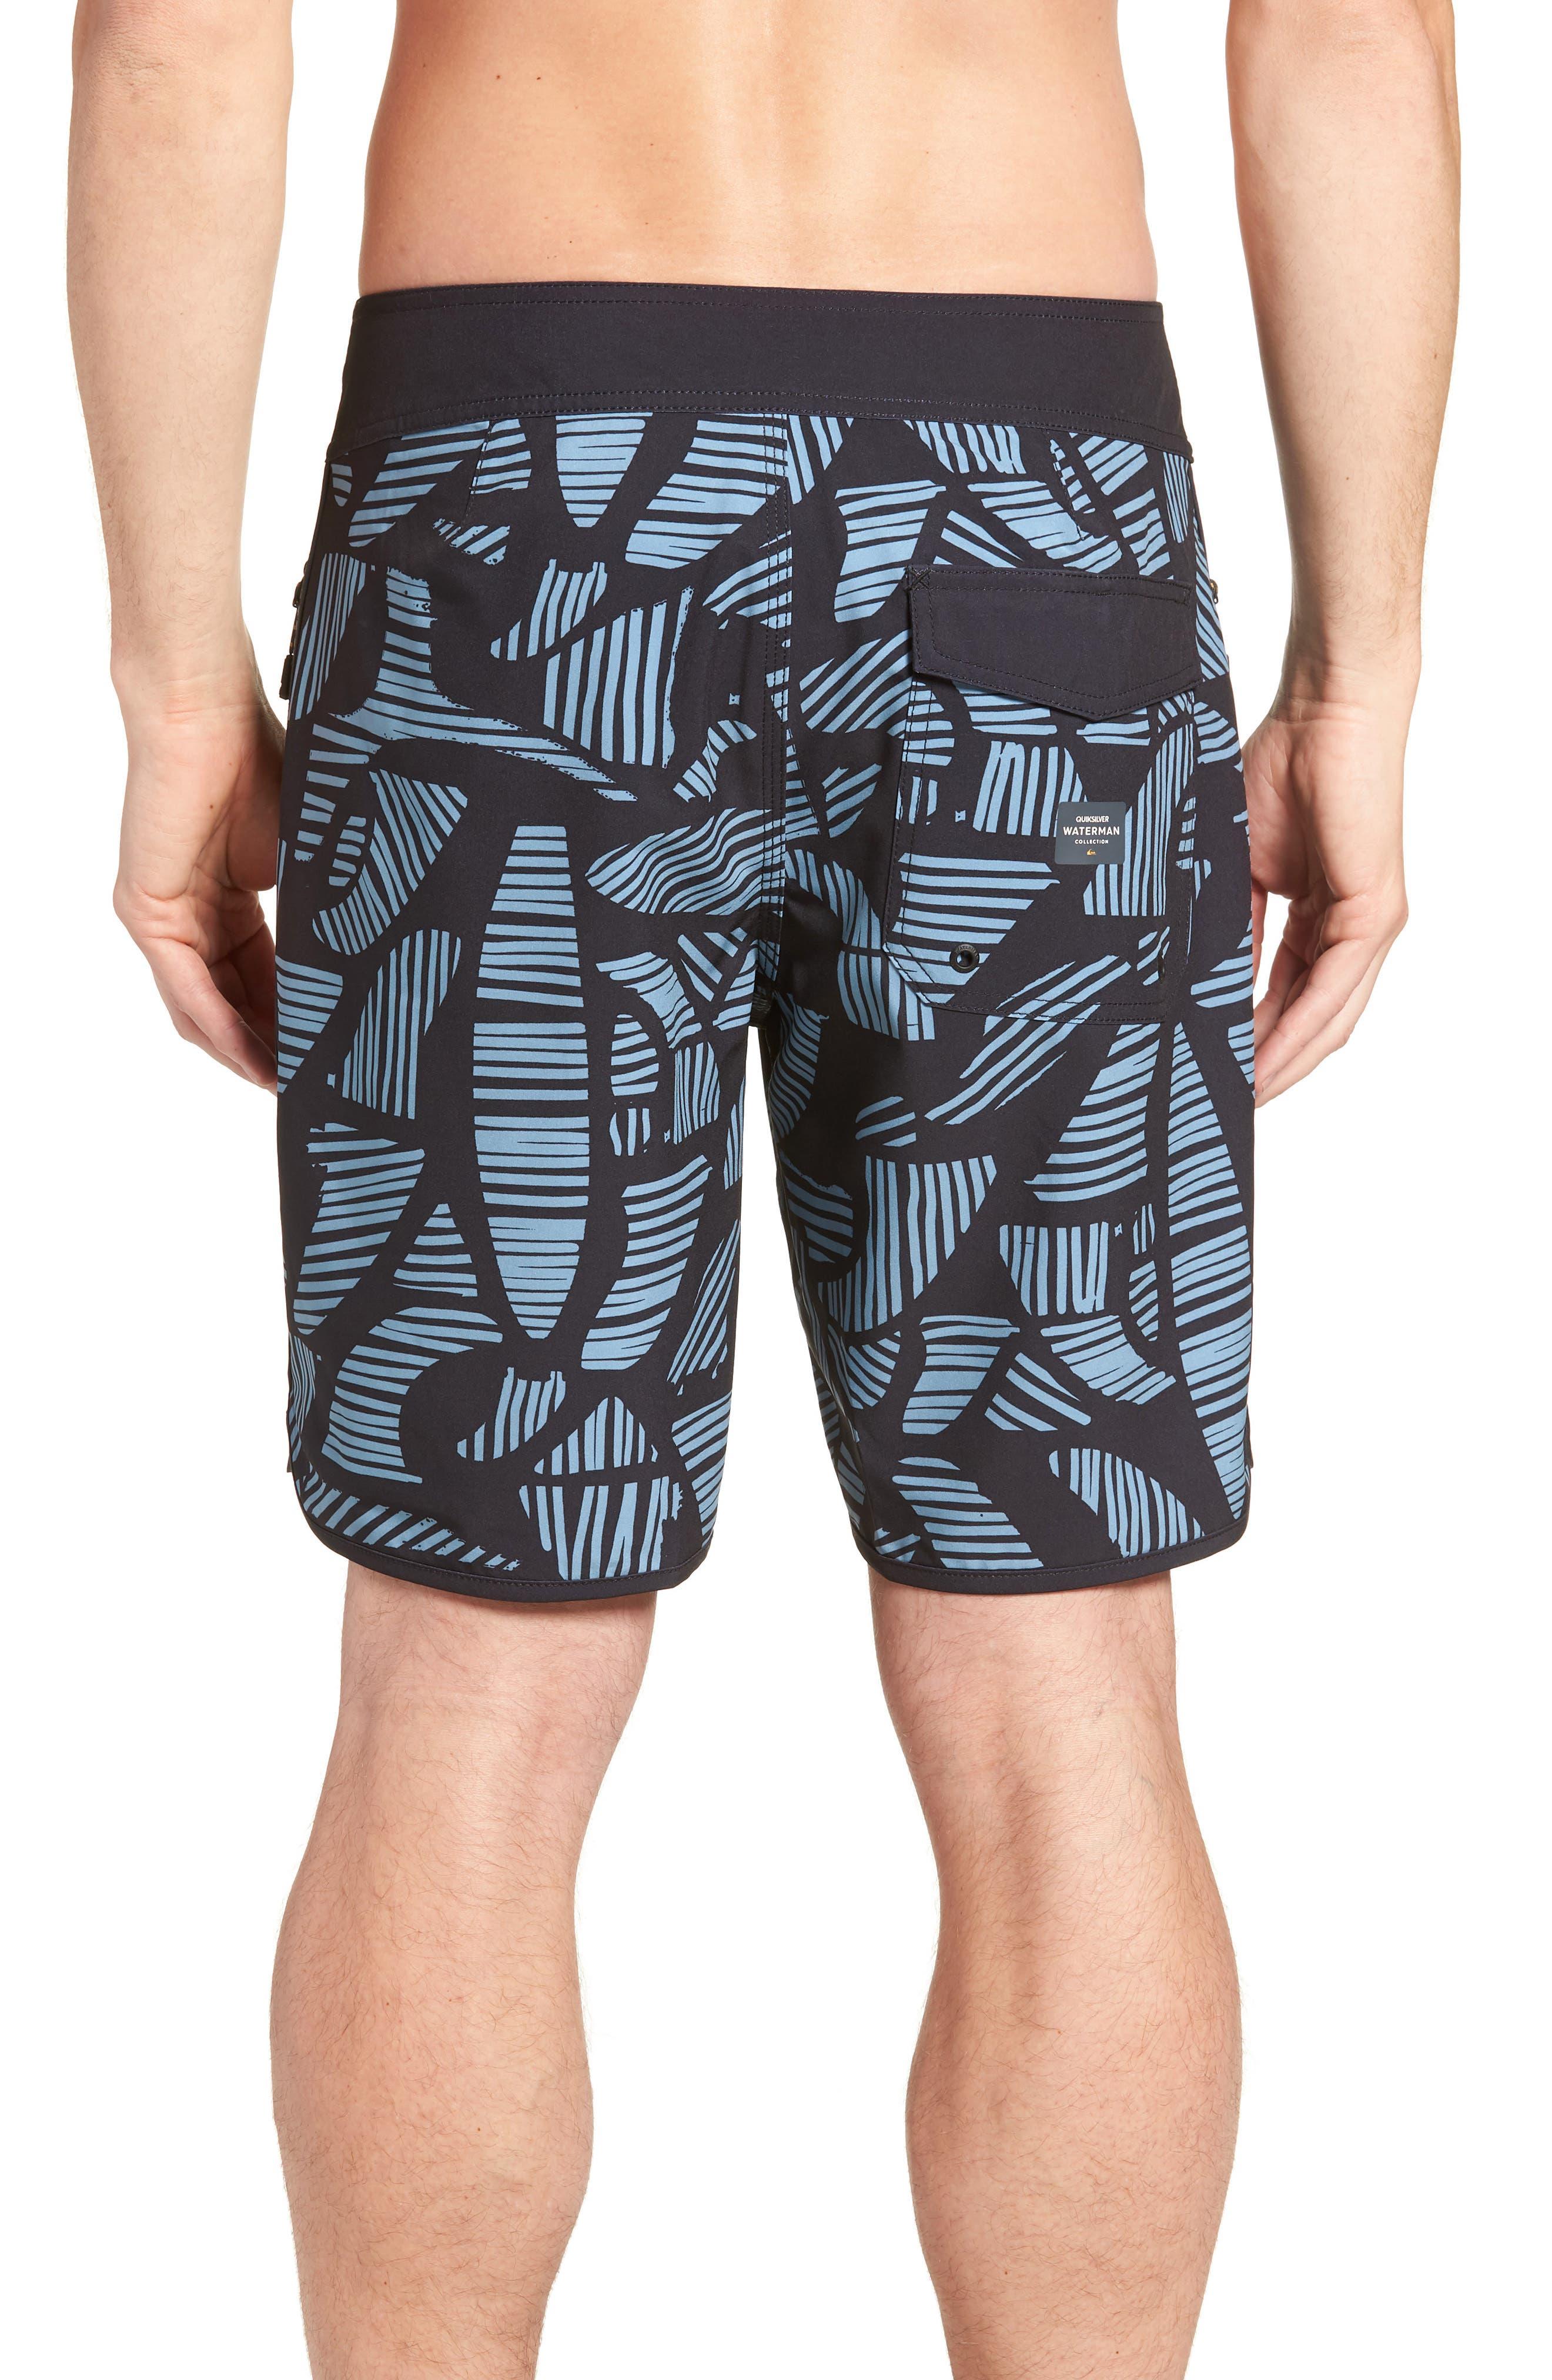 Odysea Board Shorts,                             Alternate thumbnail 2, color,                             Black